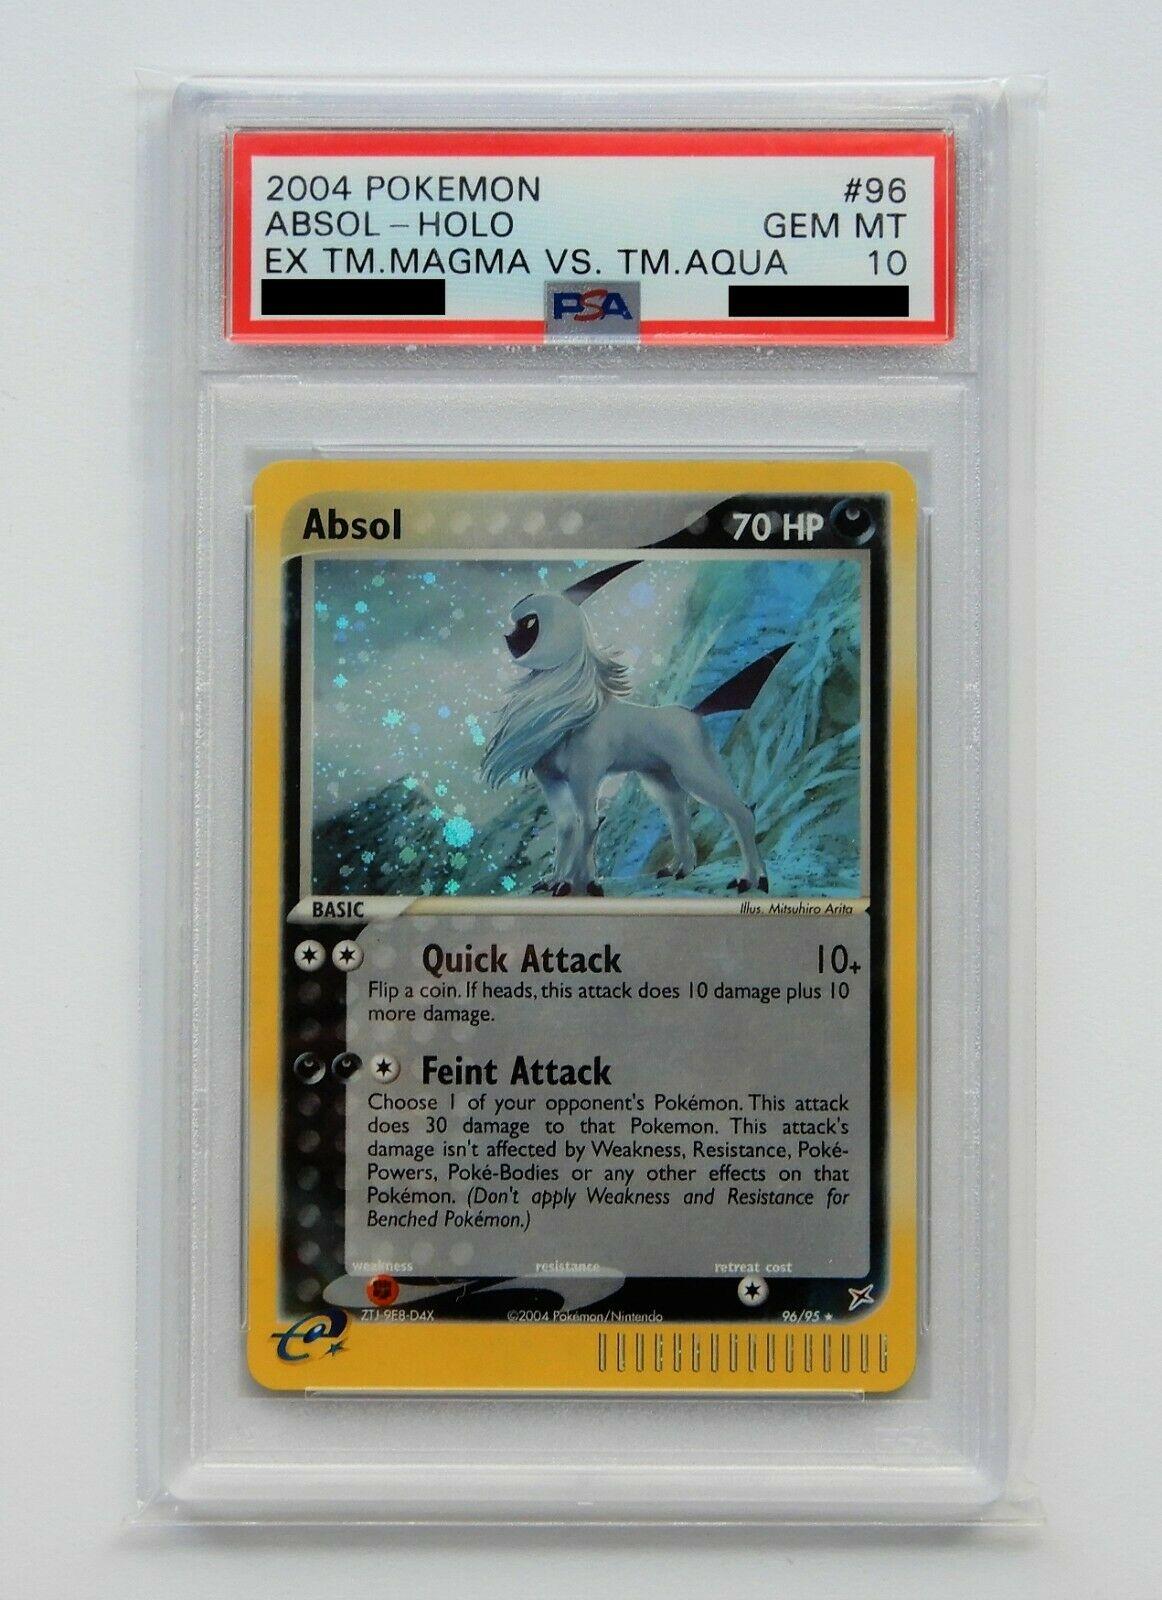 2004 Pokemon Ex Team Magma vs Aqua 9695 ABSOL Holo Secret Rare PSA 10 GEM MINT